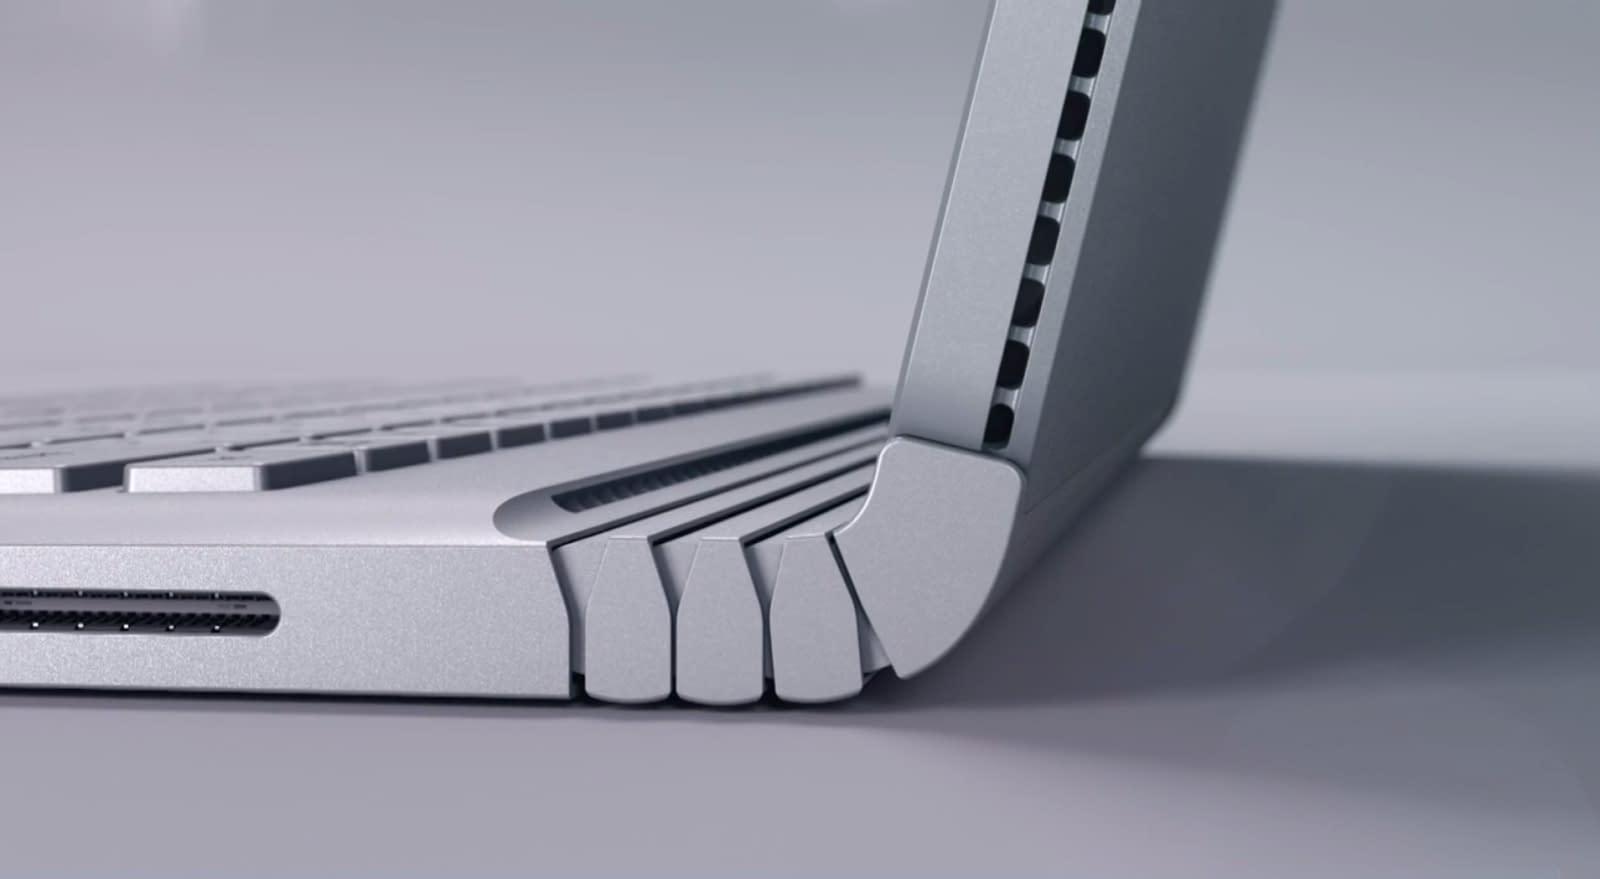 Microsoft surface book side